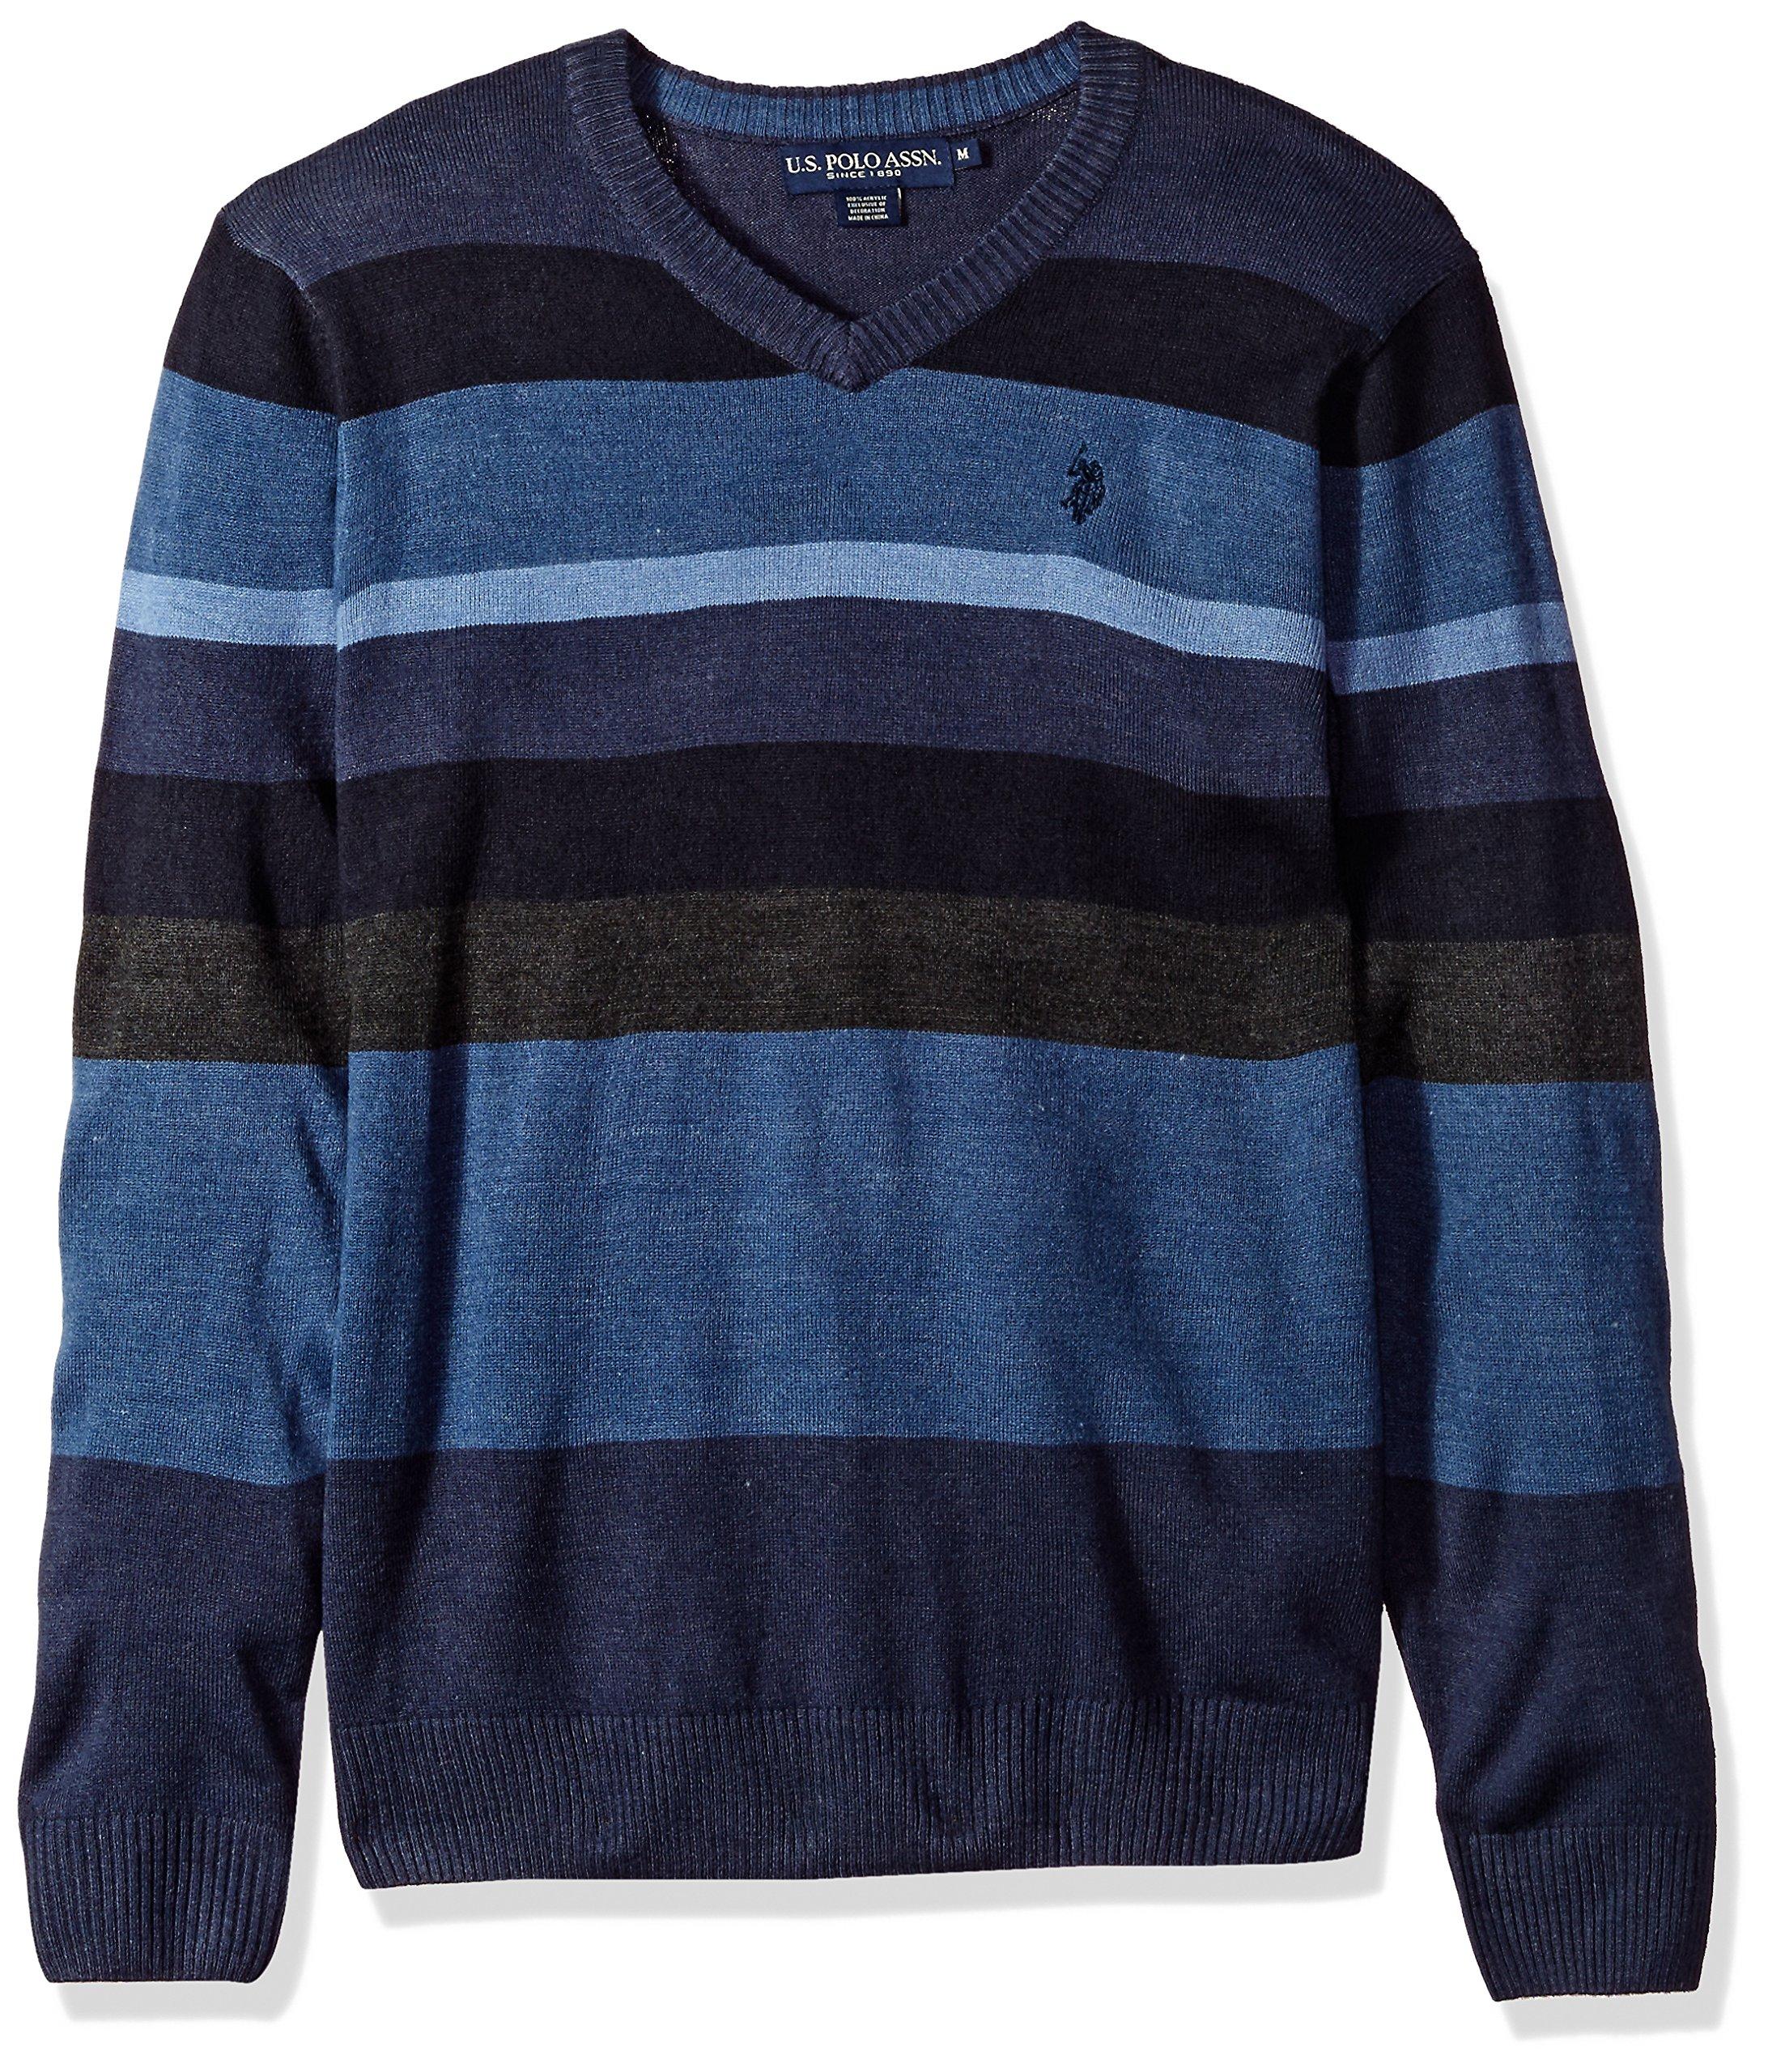 U.S. Polo Assn. Men's Multi Stripe V-Neck Sweater, Midnight Heather, Large